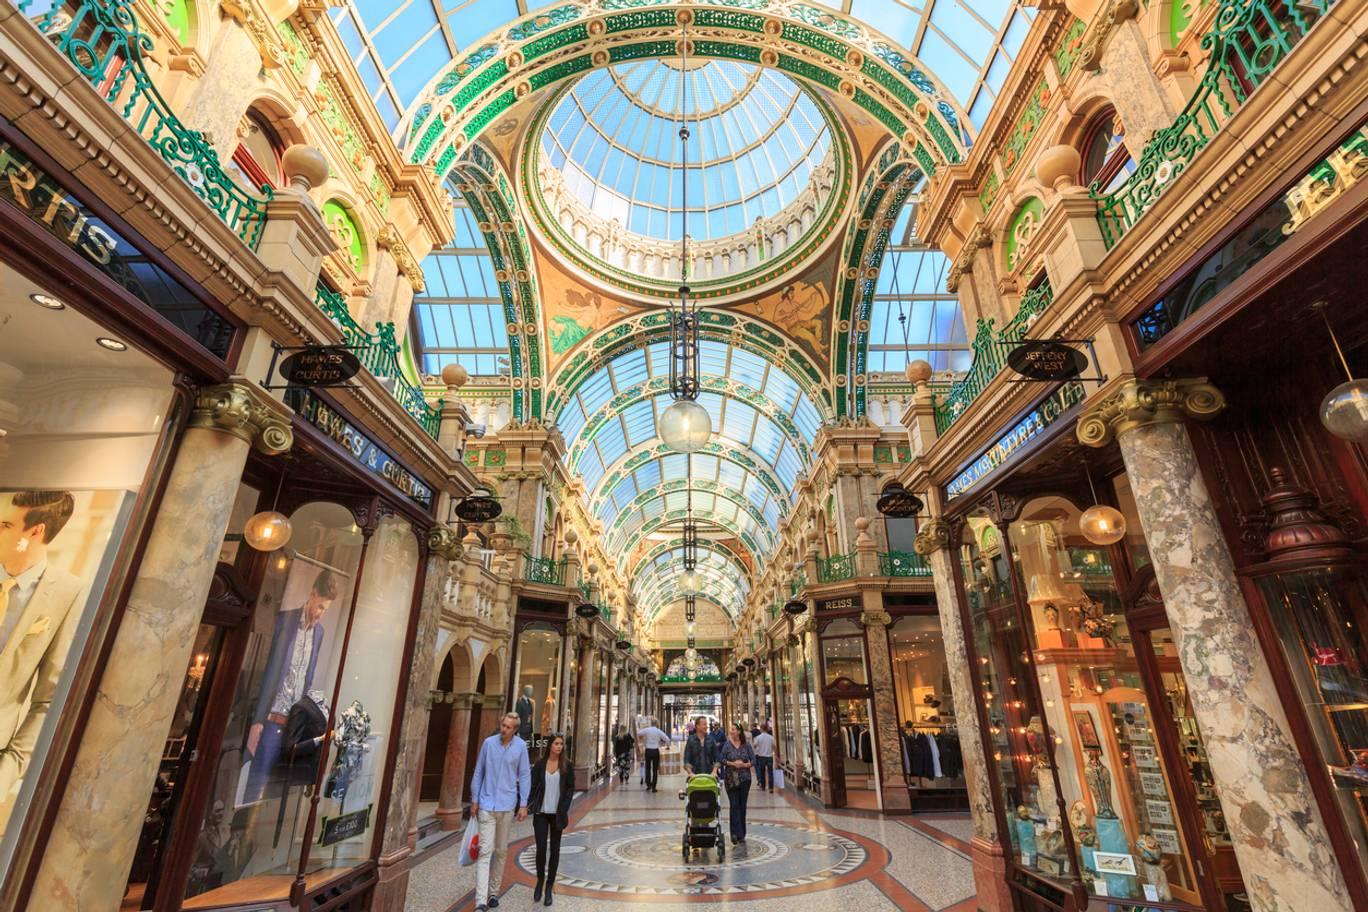 Image of Leeds Victoria Quarter shopping precinct